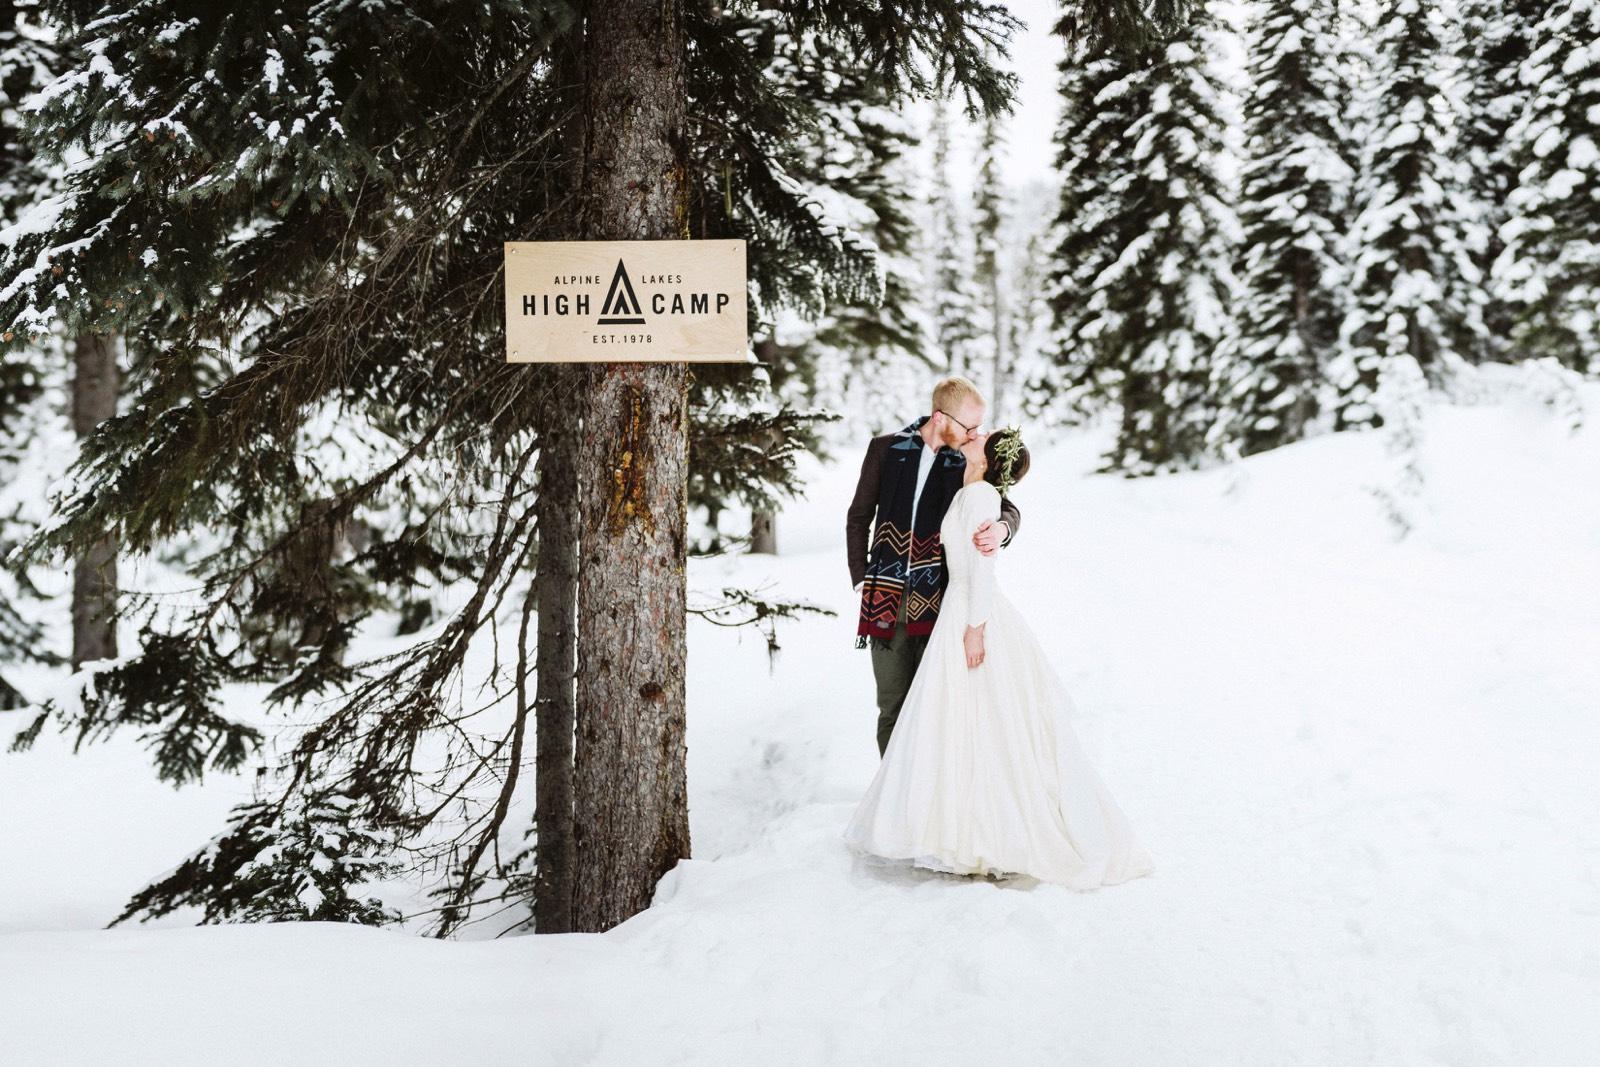 alpine-lakes-high-camp-winter-wedding-73 ALPINE LAKES HIGH CAMP WEDDING